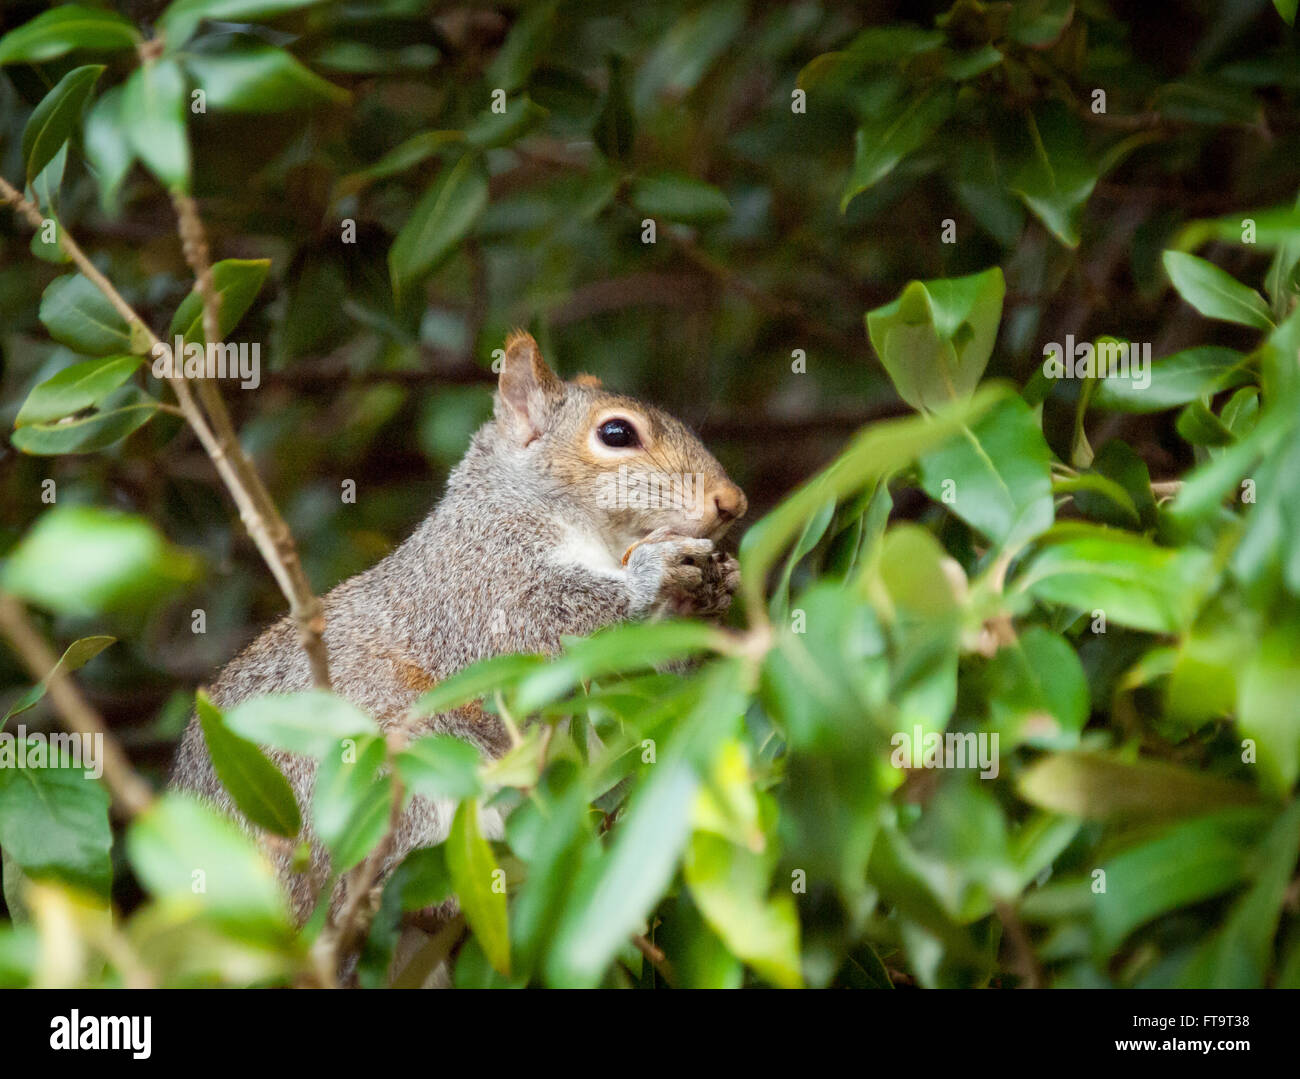 An eastern grey squirrel (Sciurus carolinensis) in a tree in Beacon Hill Park in Victoria, British Columbia, Canada. - Stock Image